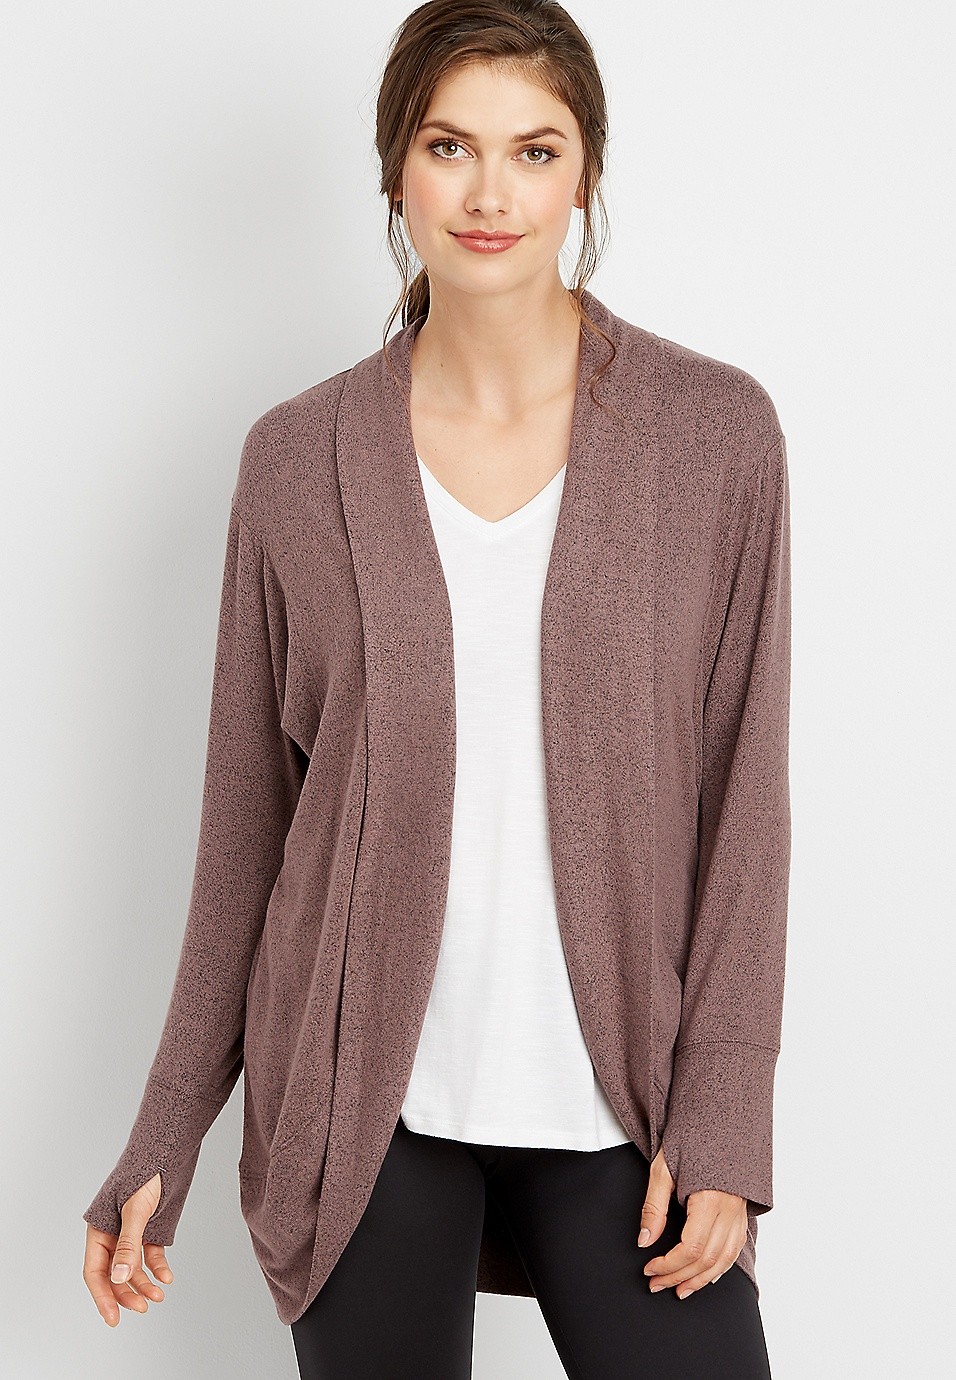 huge discount 4da6a 86379 cocoon long sleeve cardigan